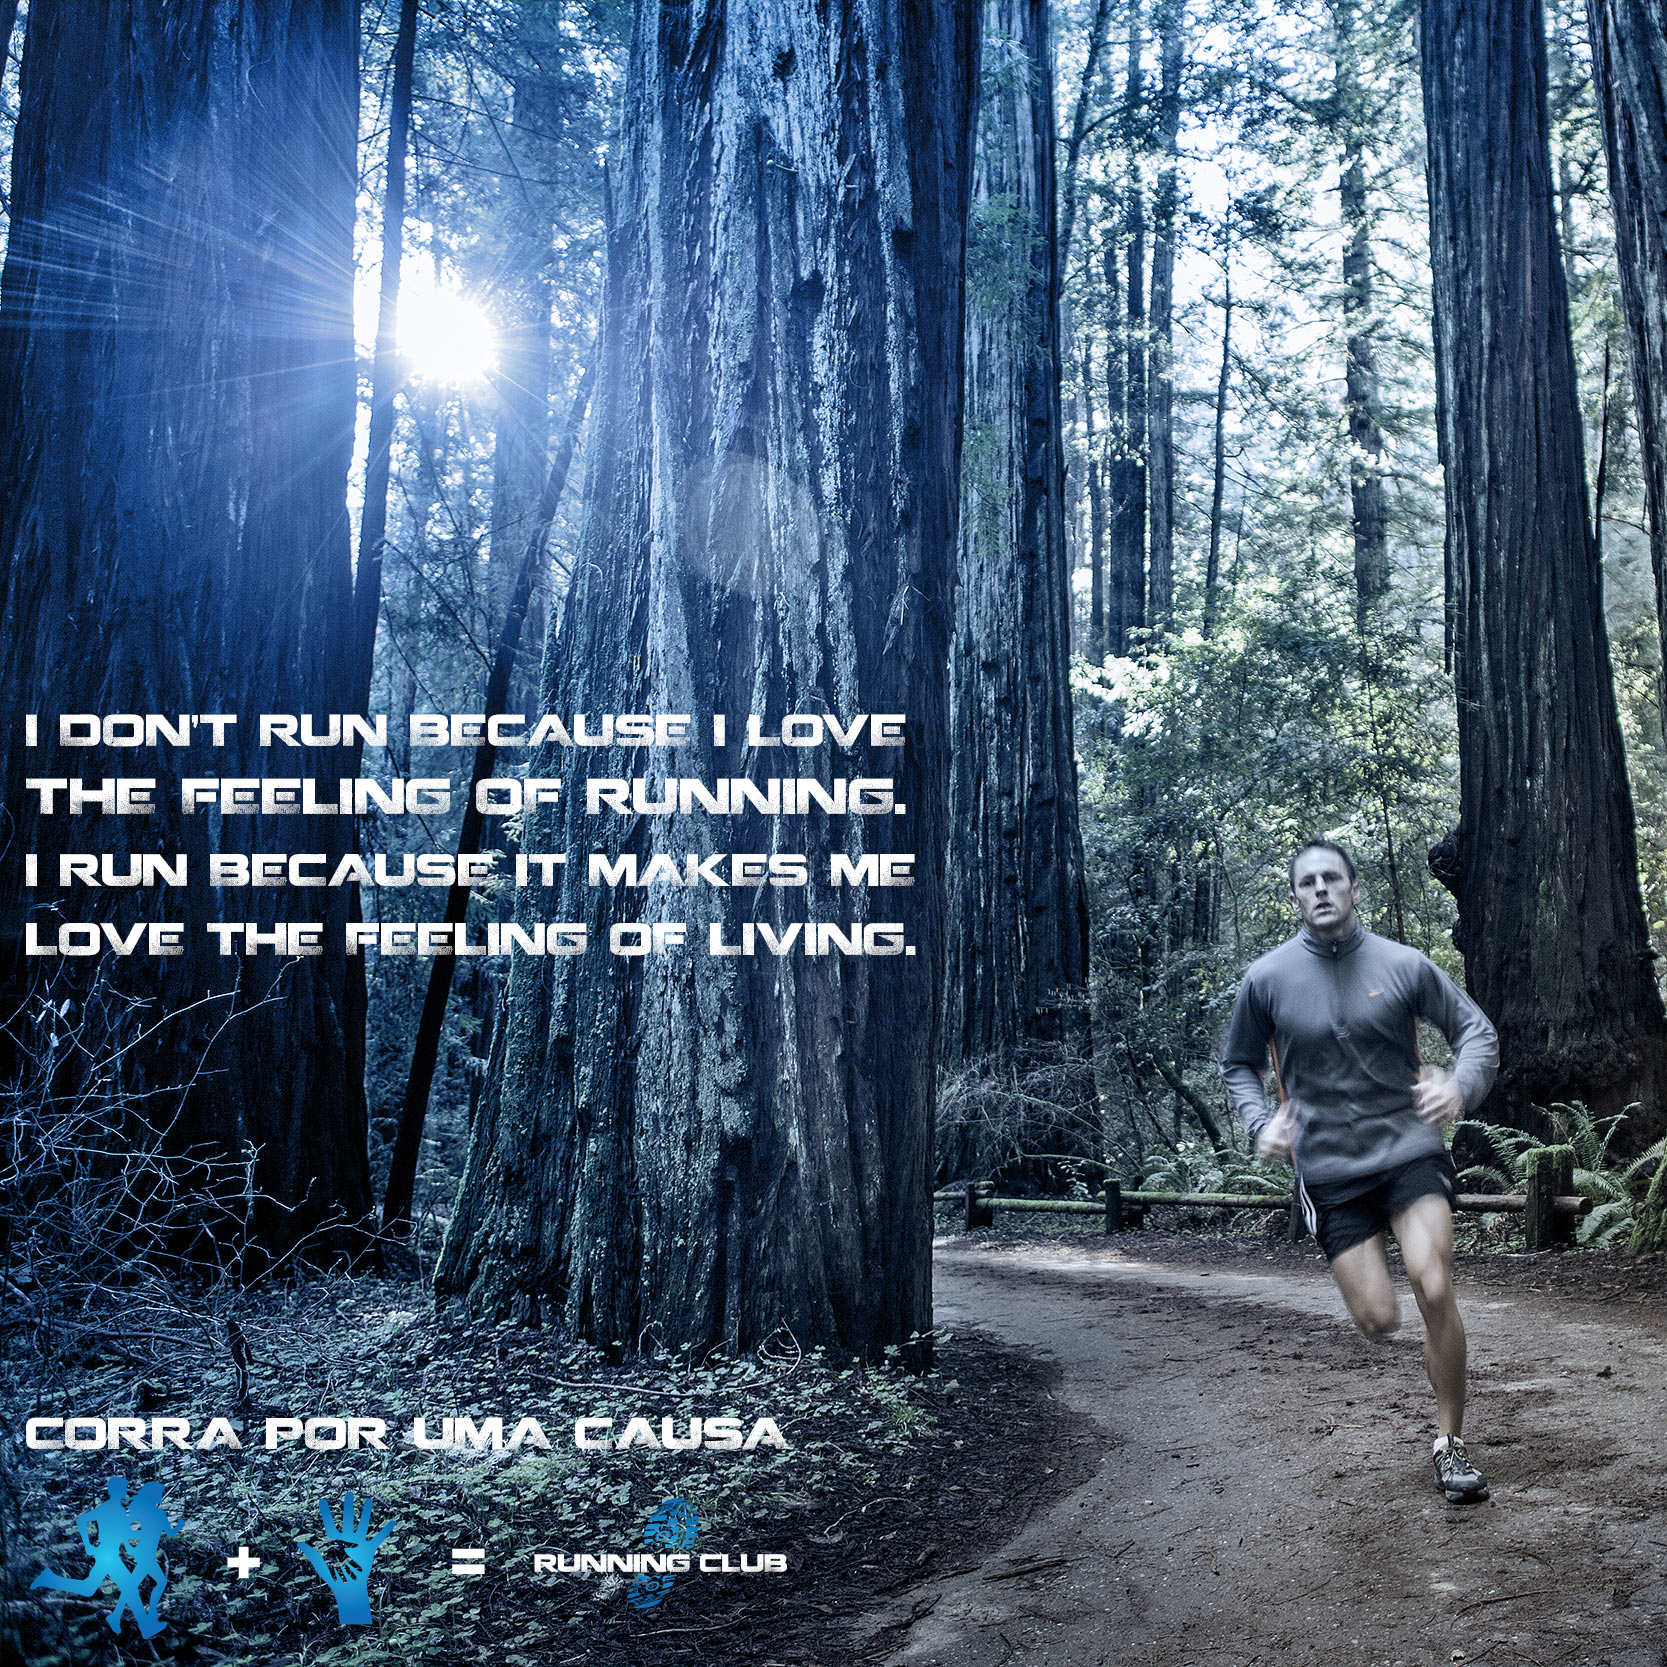 I don't run because I love the feeling of running. I run because it makes me love the feeling of living.   www.runningclub.pt